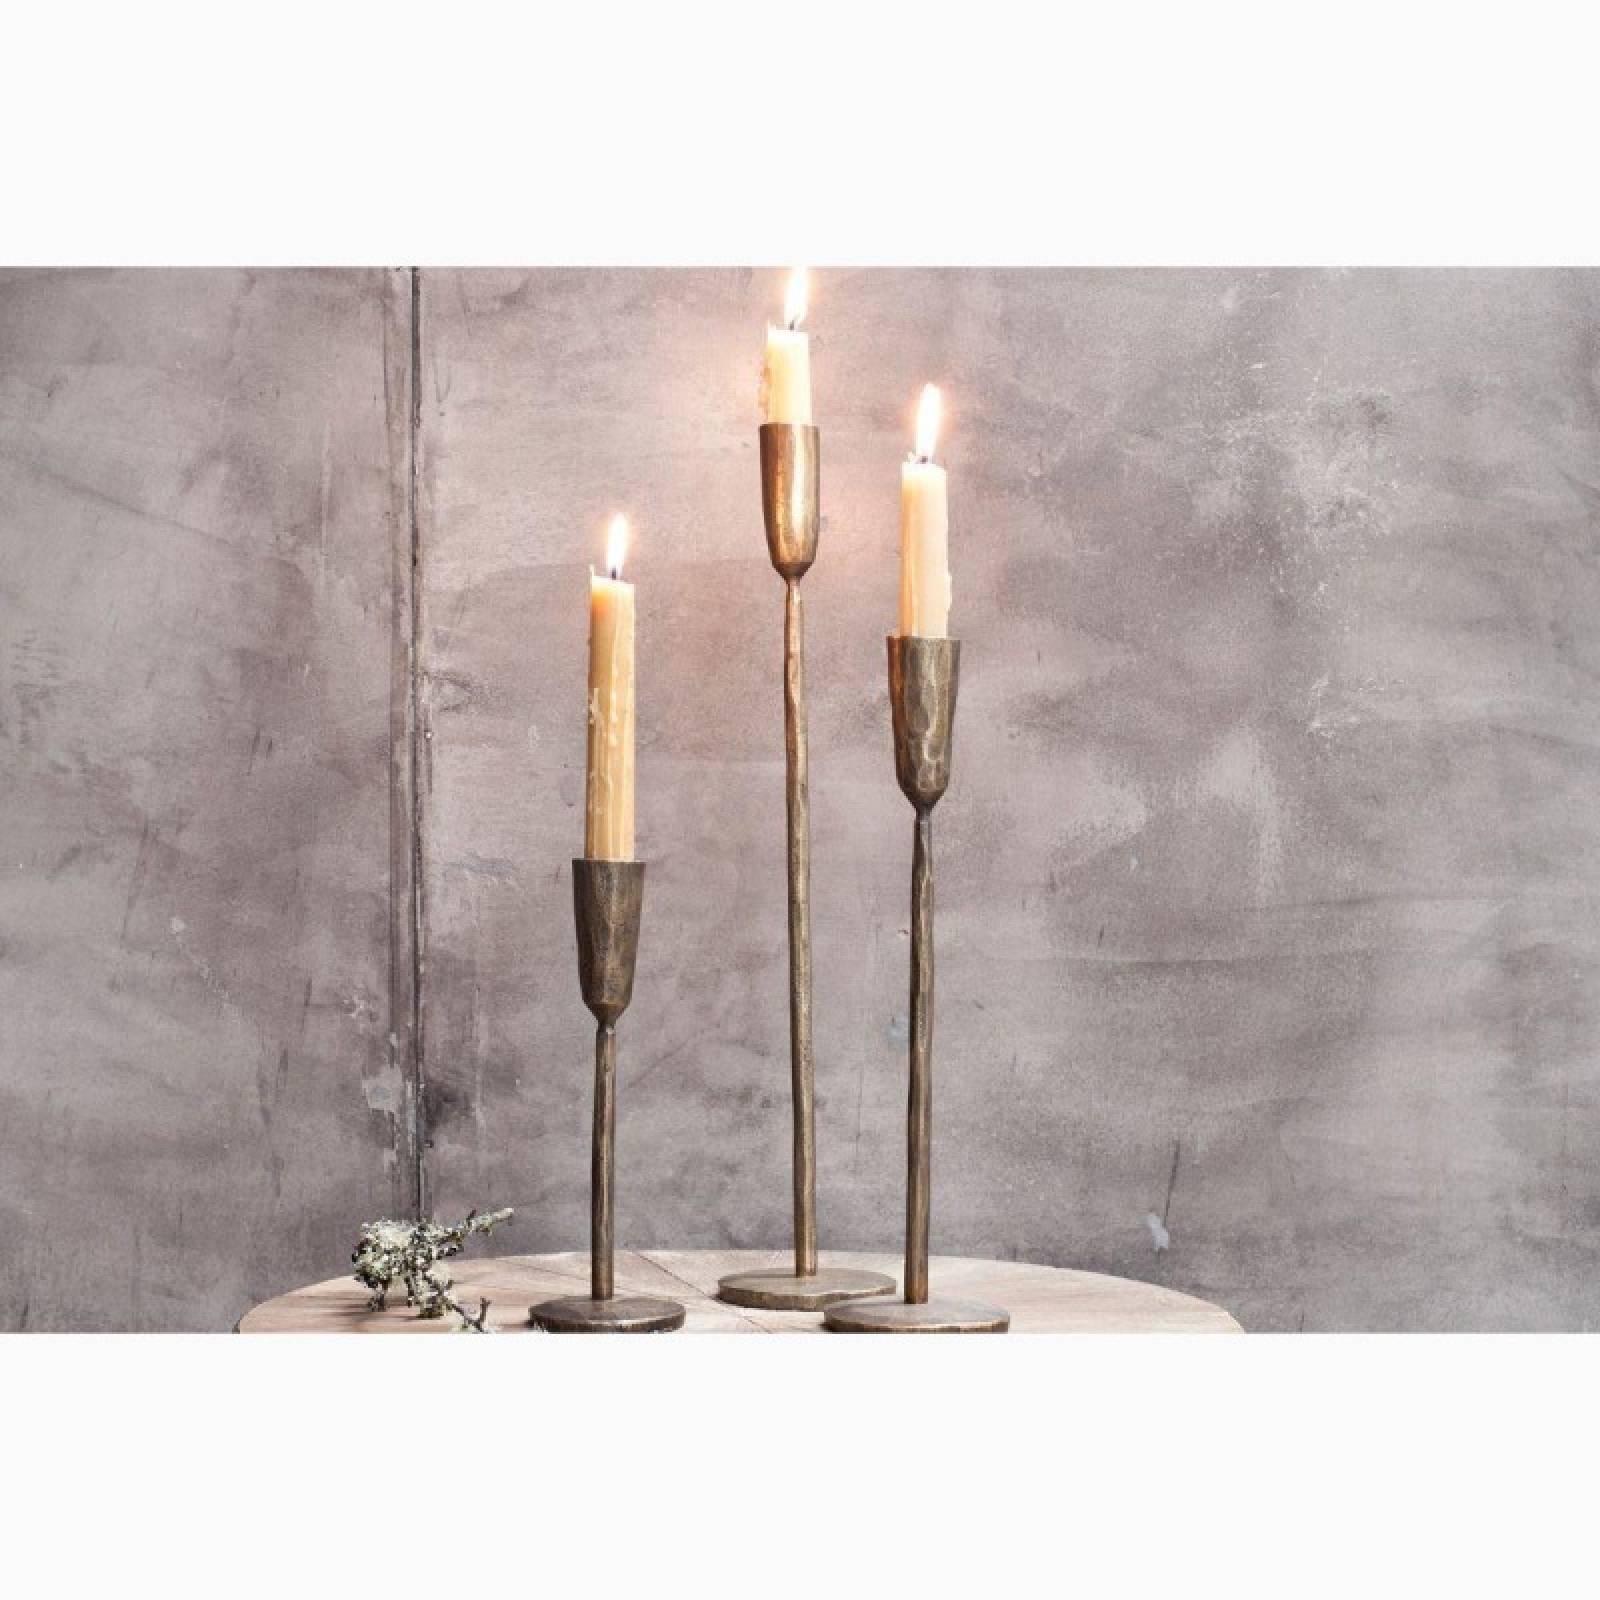 Medium Antiqued Brass Candlestick H:30cm thumbnails